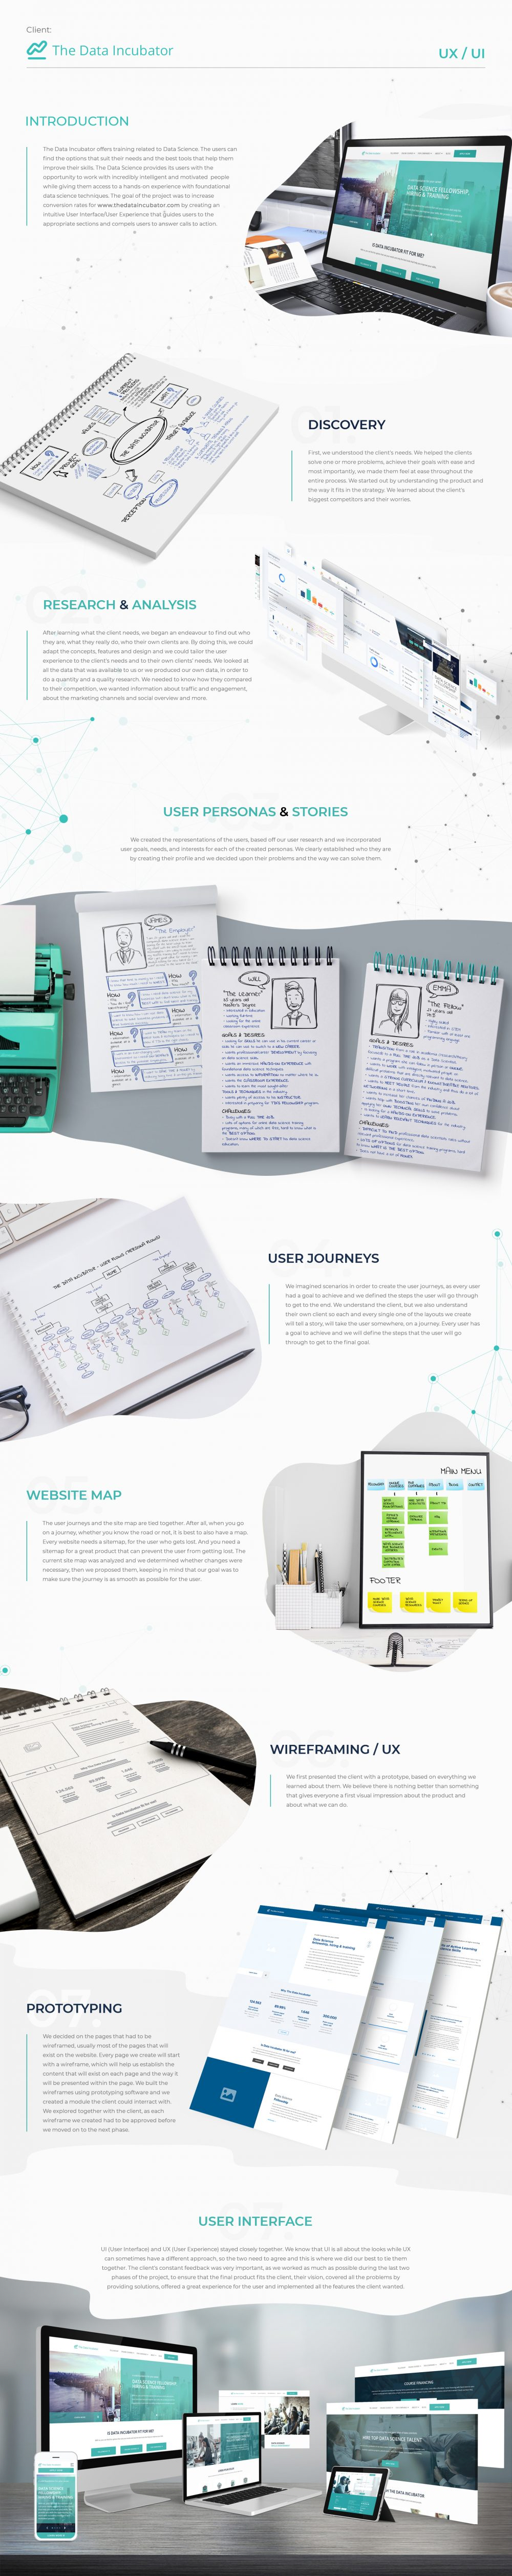 TDI - UI/UX Study Case